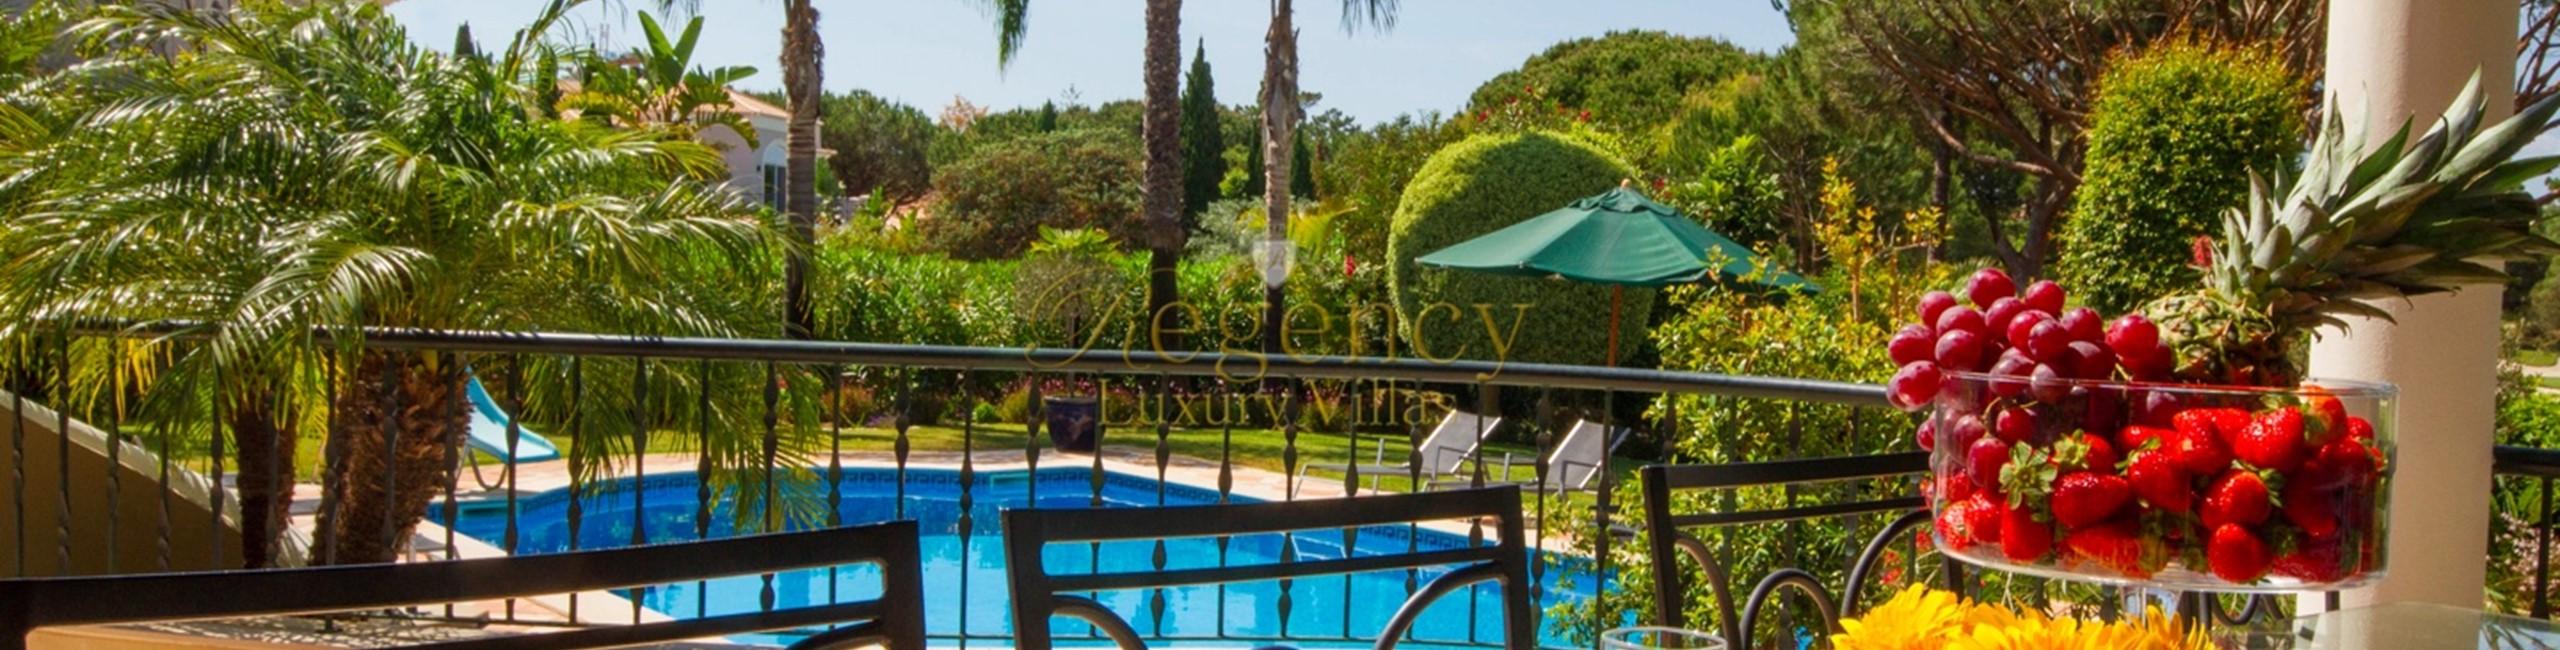 6 Bedroom Villa To Rent In Quinta Do Lago Portugal